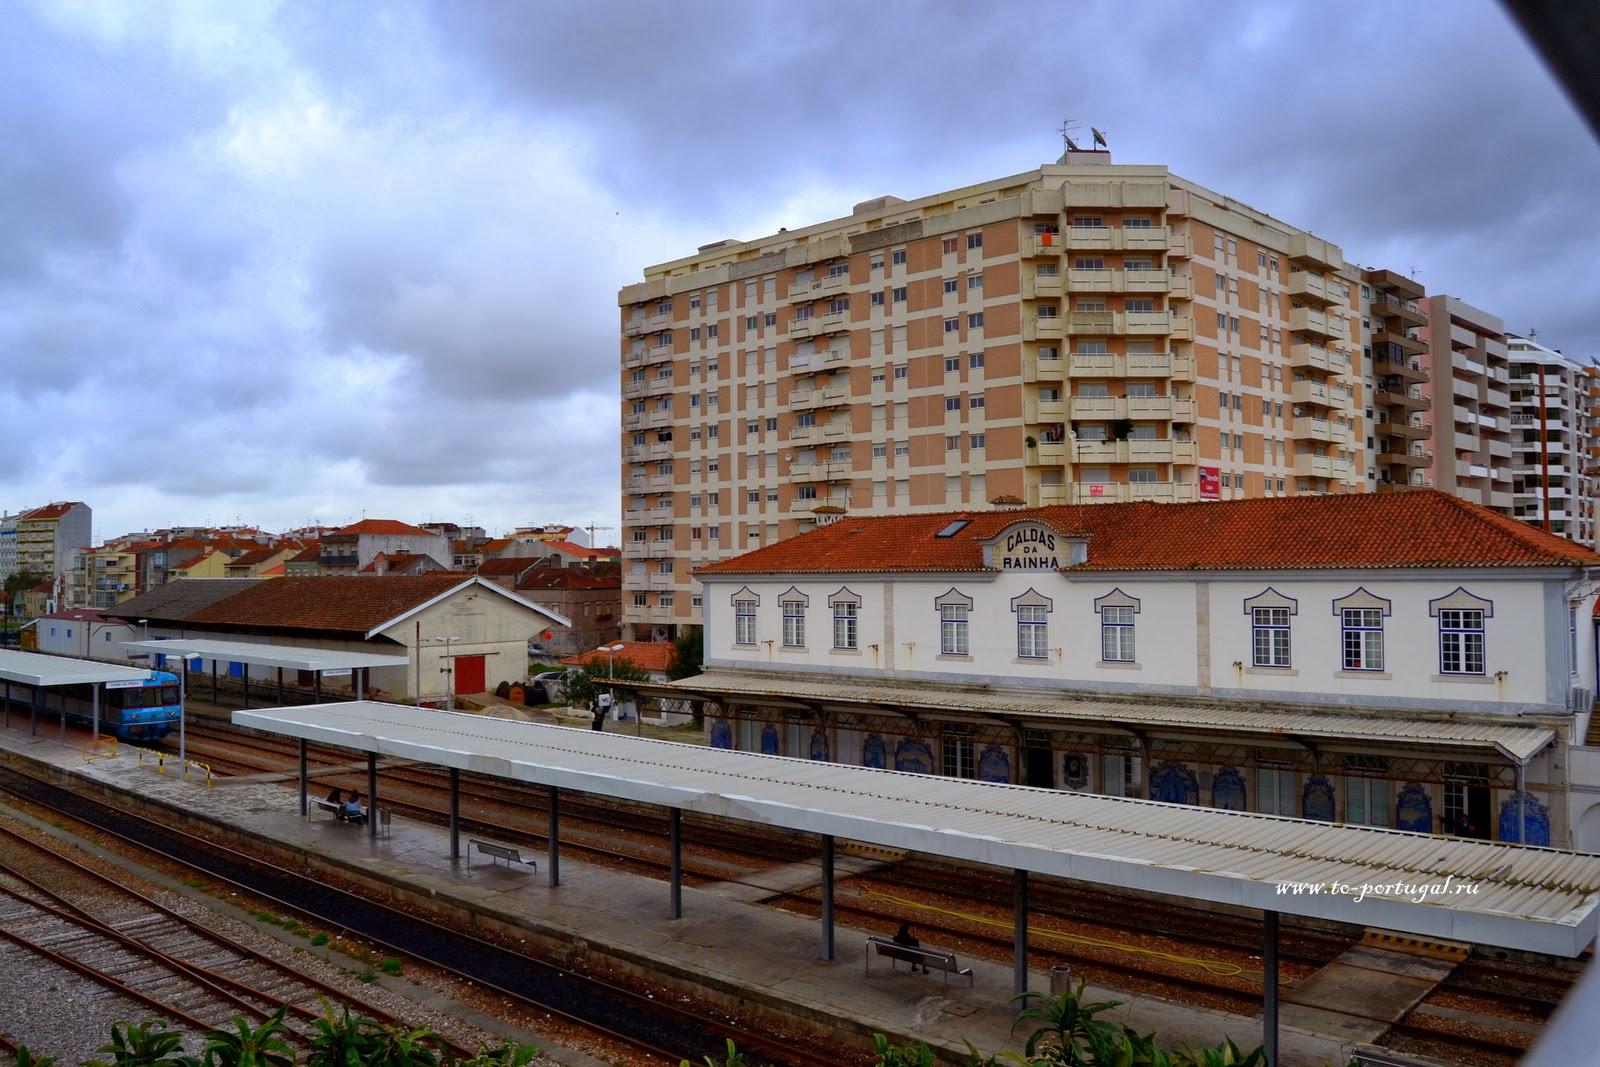 вокзал в Калдаш да Раинья